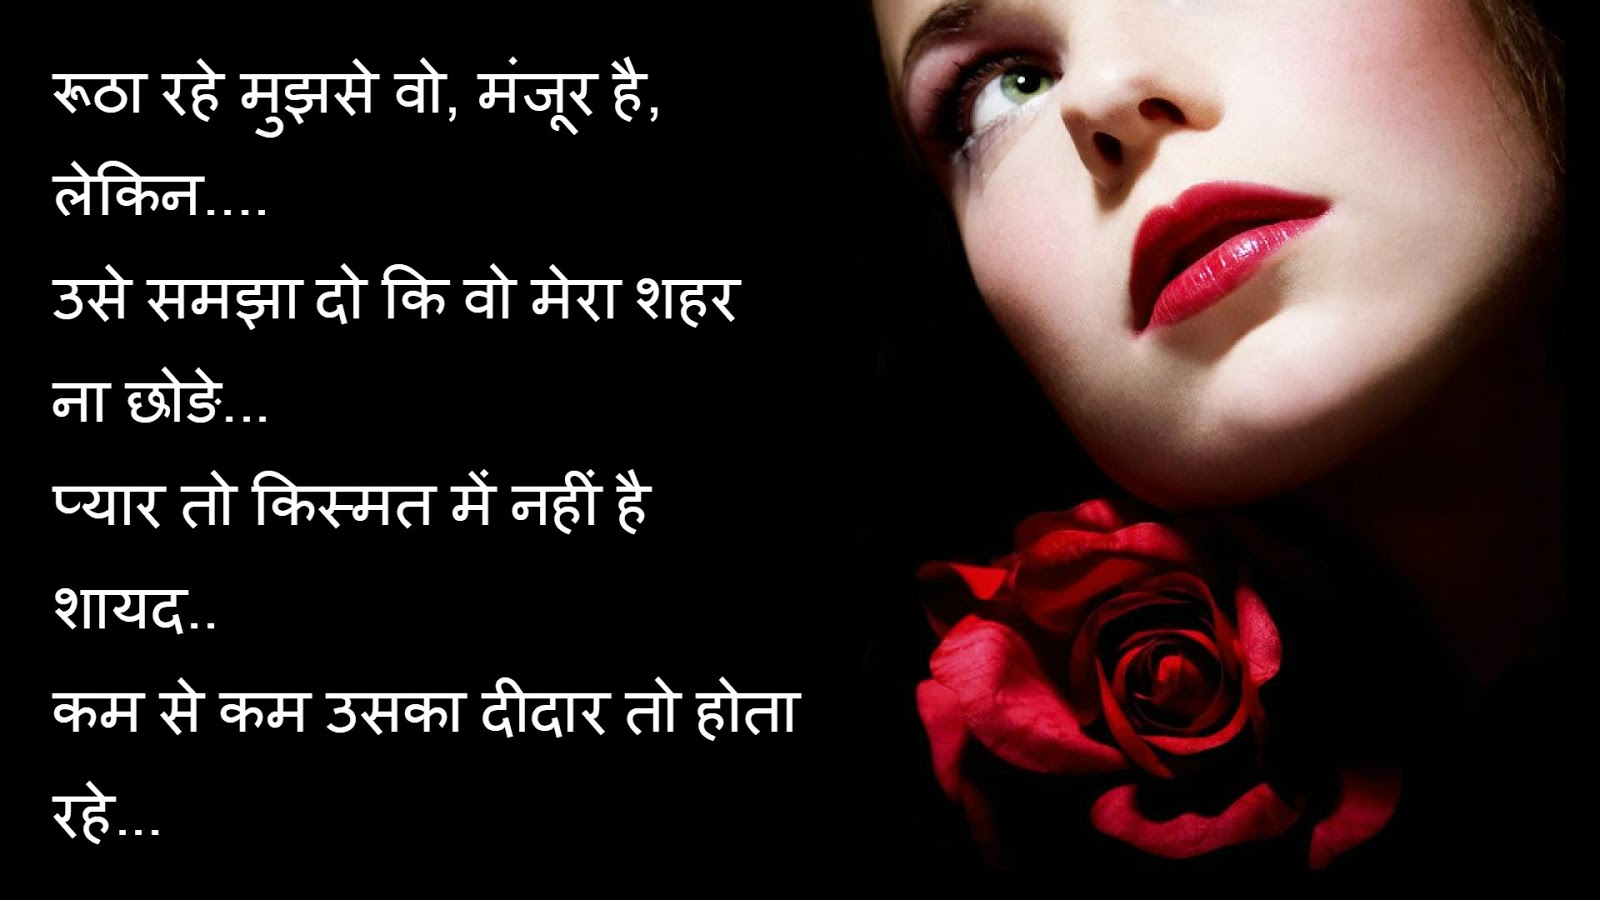 Good Night Image Love Shayari Hd Best Hd Wallpaper